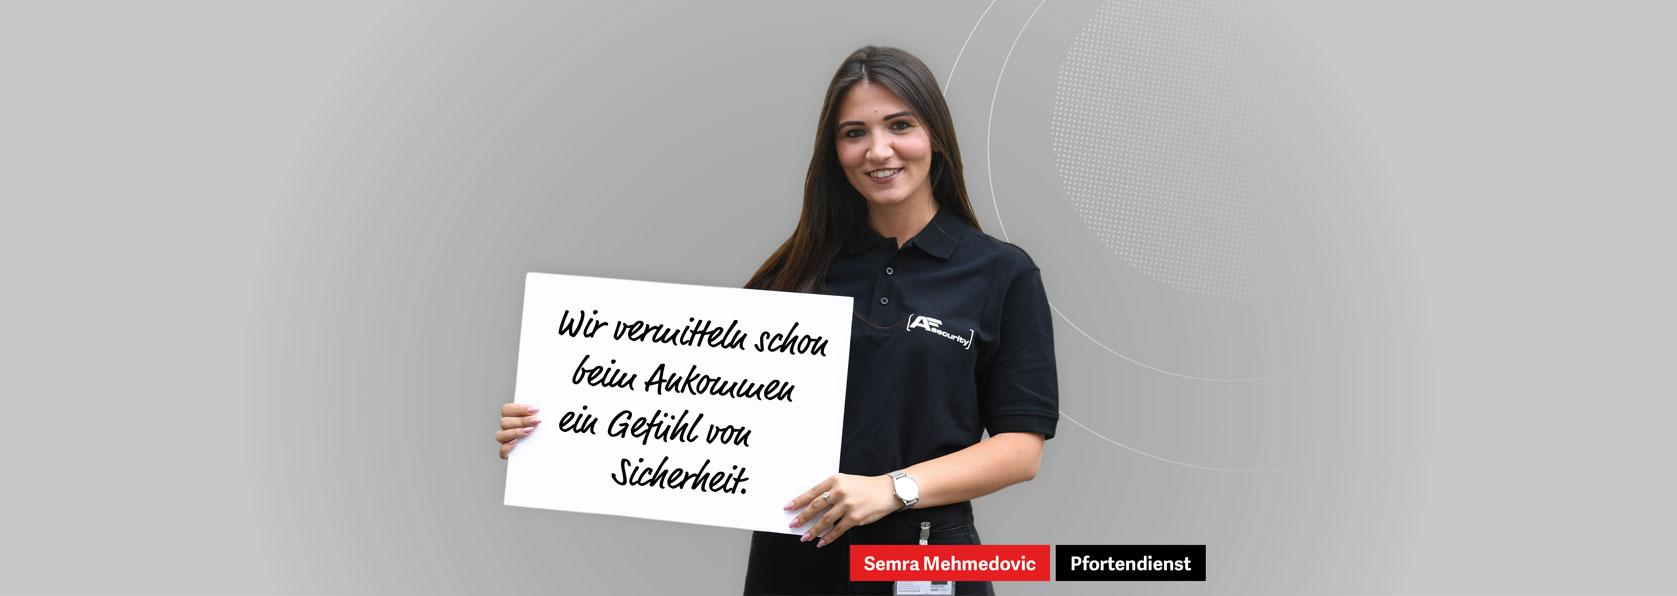 slider_semra_mehmedovic